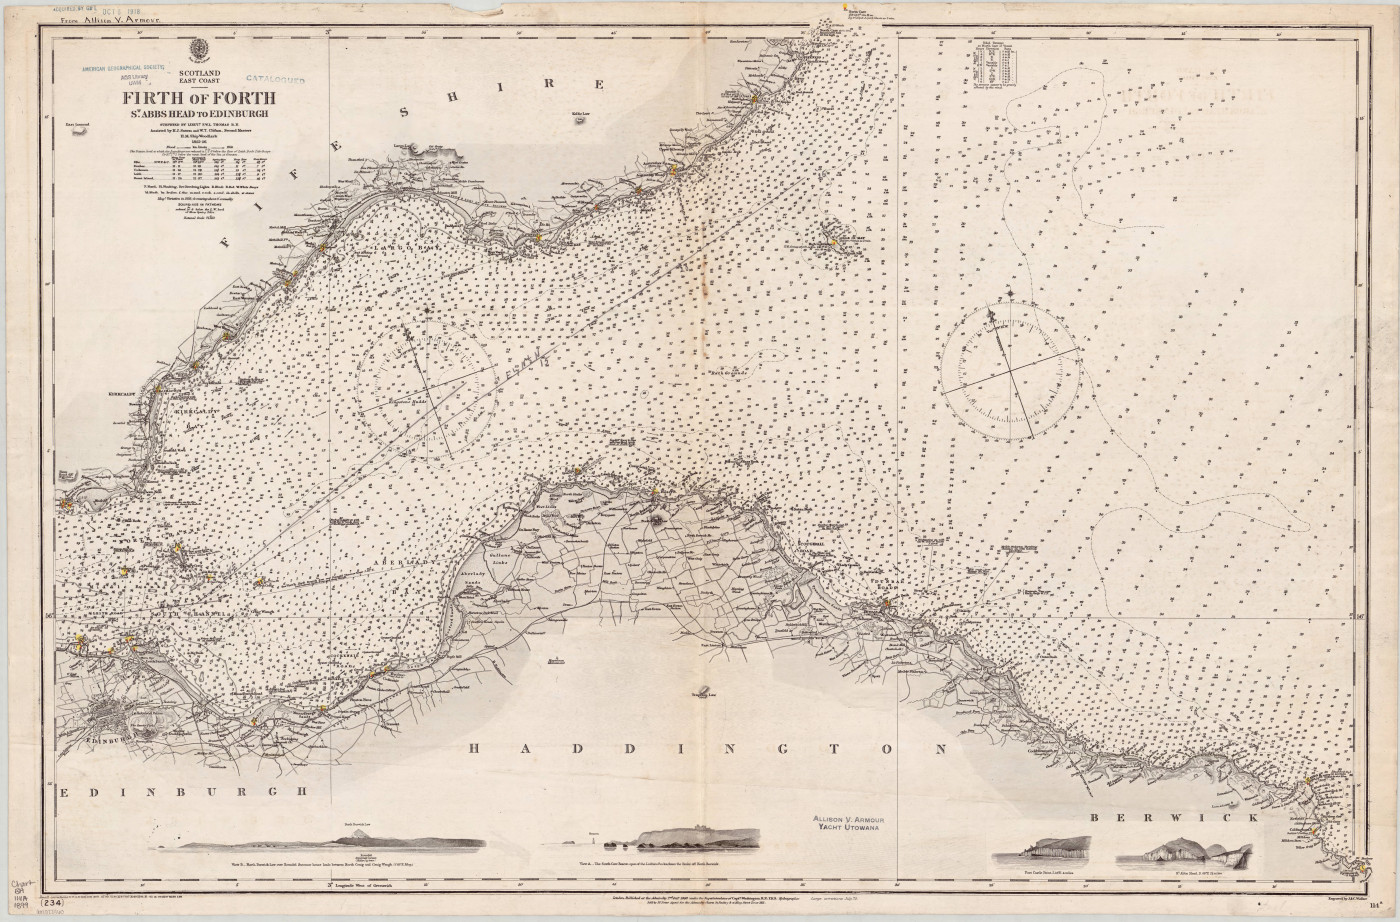 Admiralty Chart No 114a Firth of Forth St Abbs Head to Edinburgh, 1860